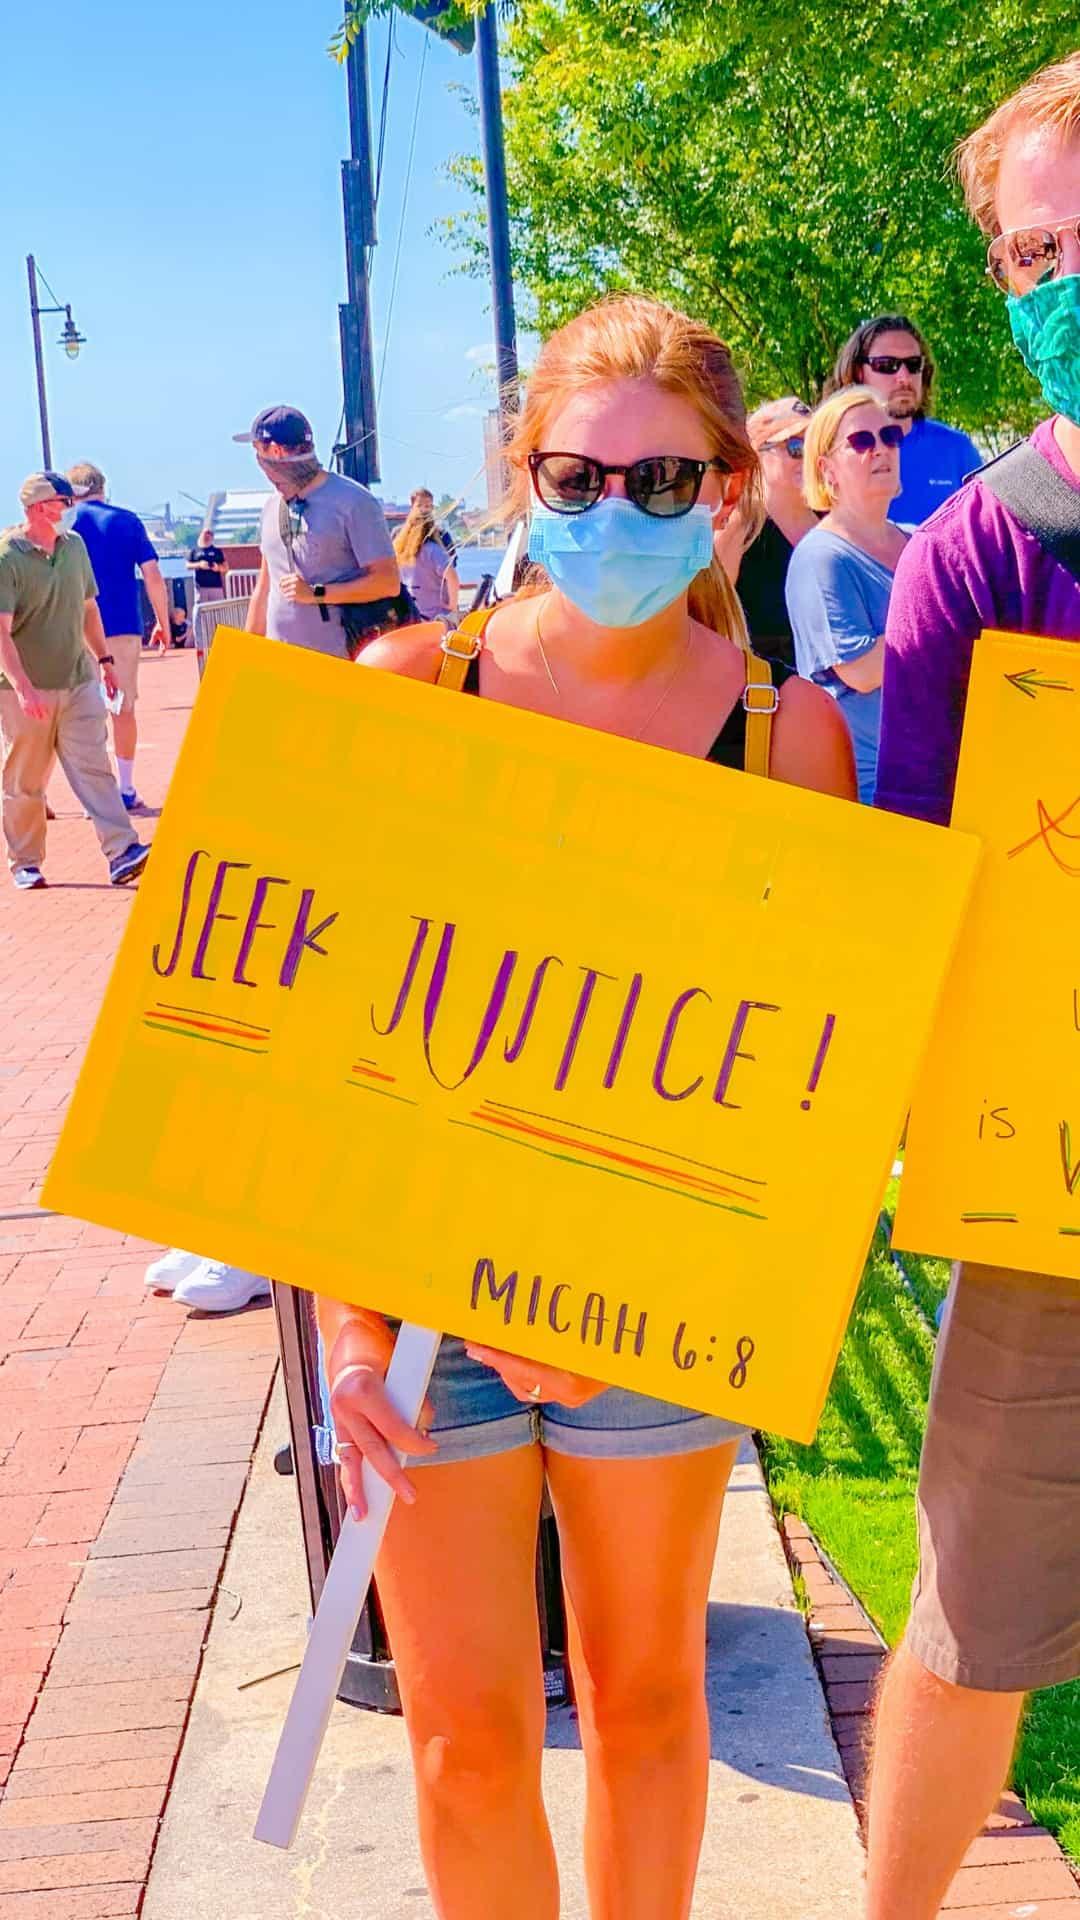 Seek justice Micah 6:8 protest sign